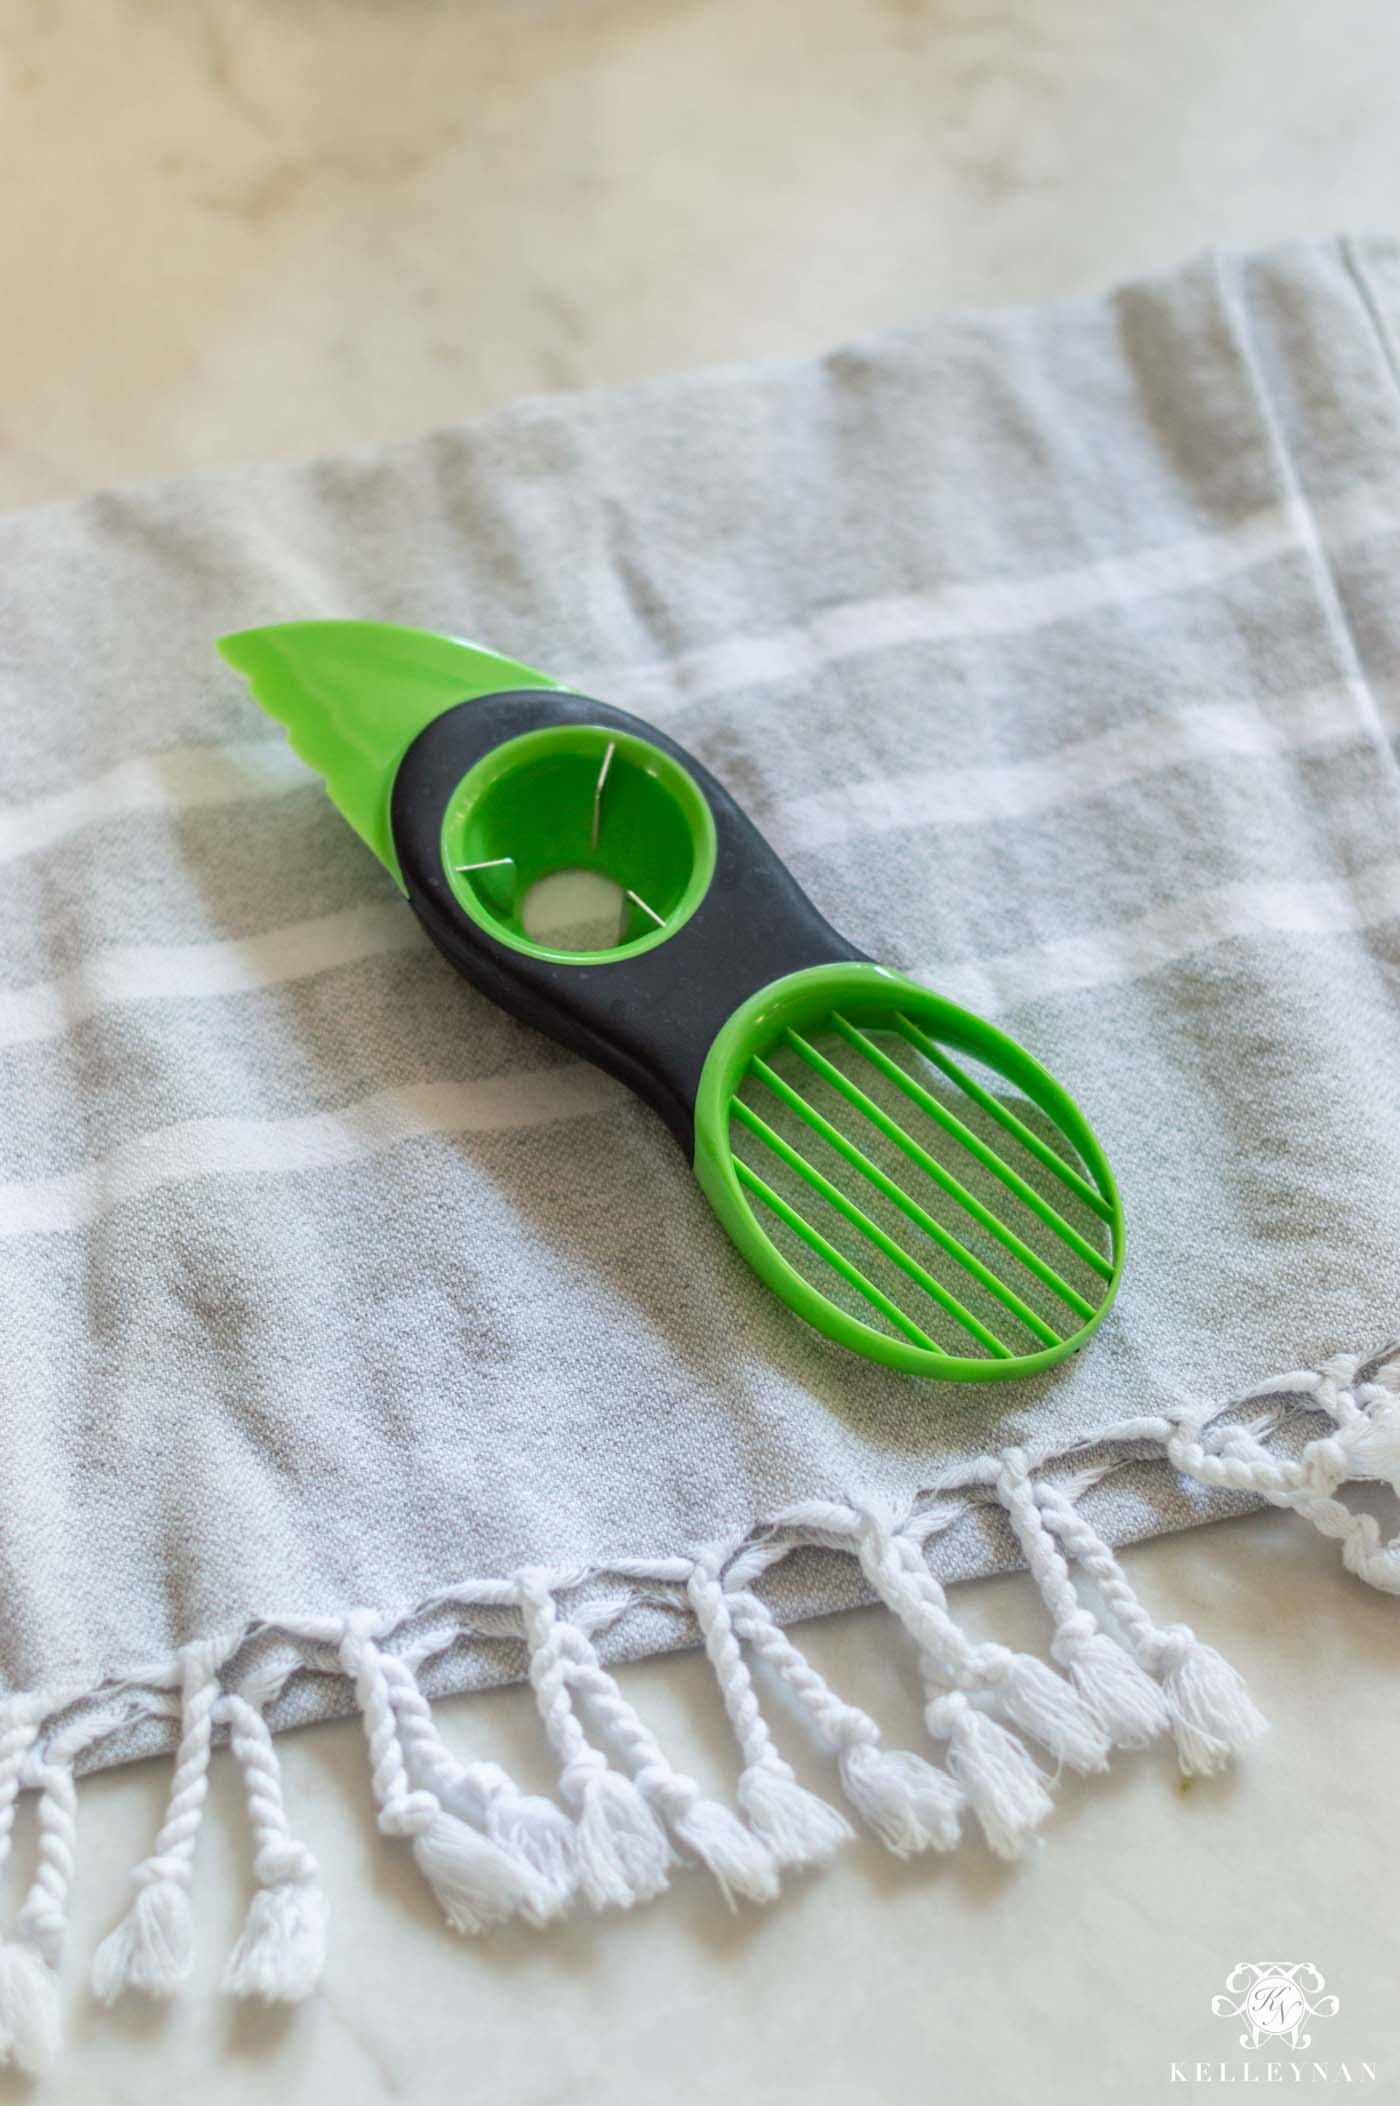 Favorite Amazon Kitchen Gadgets